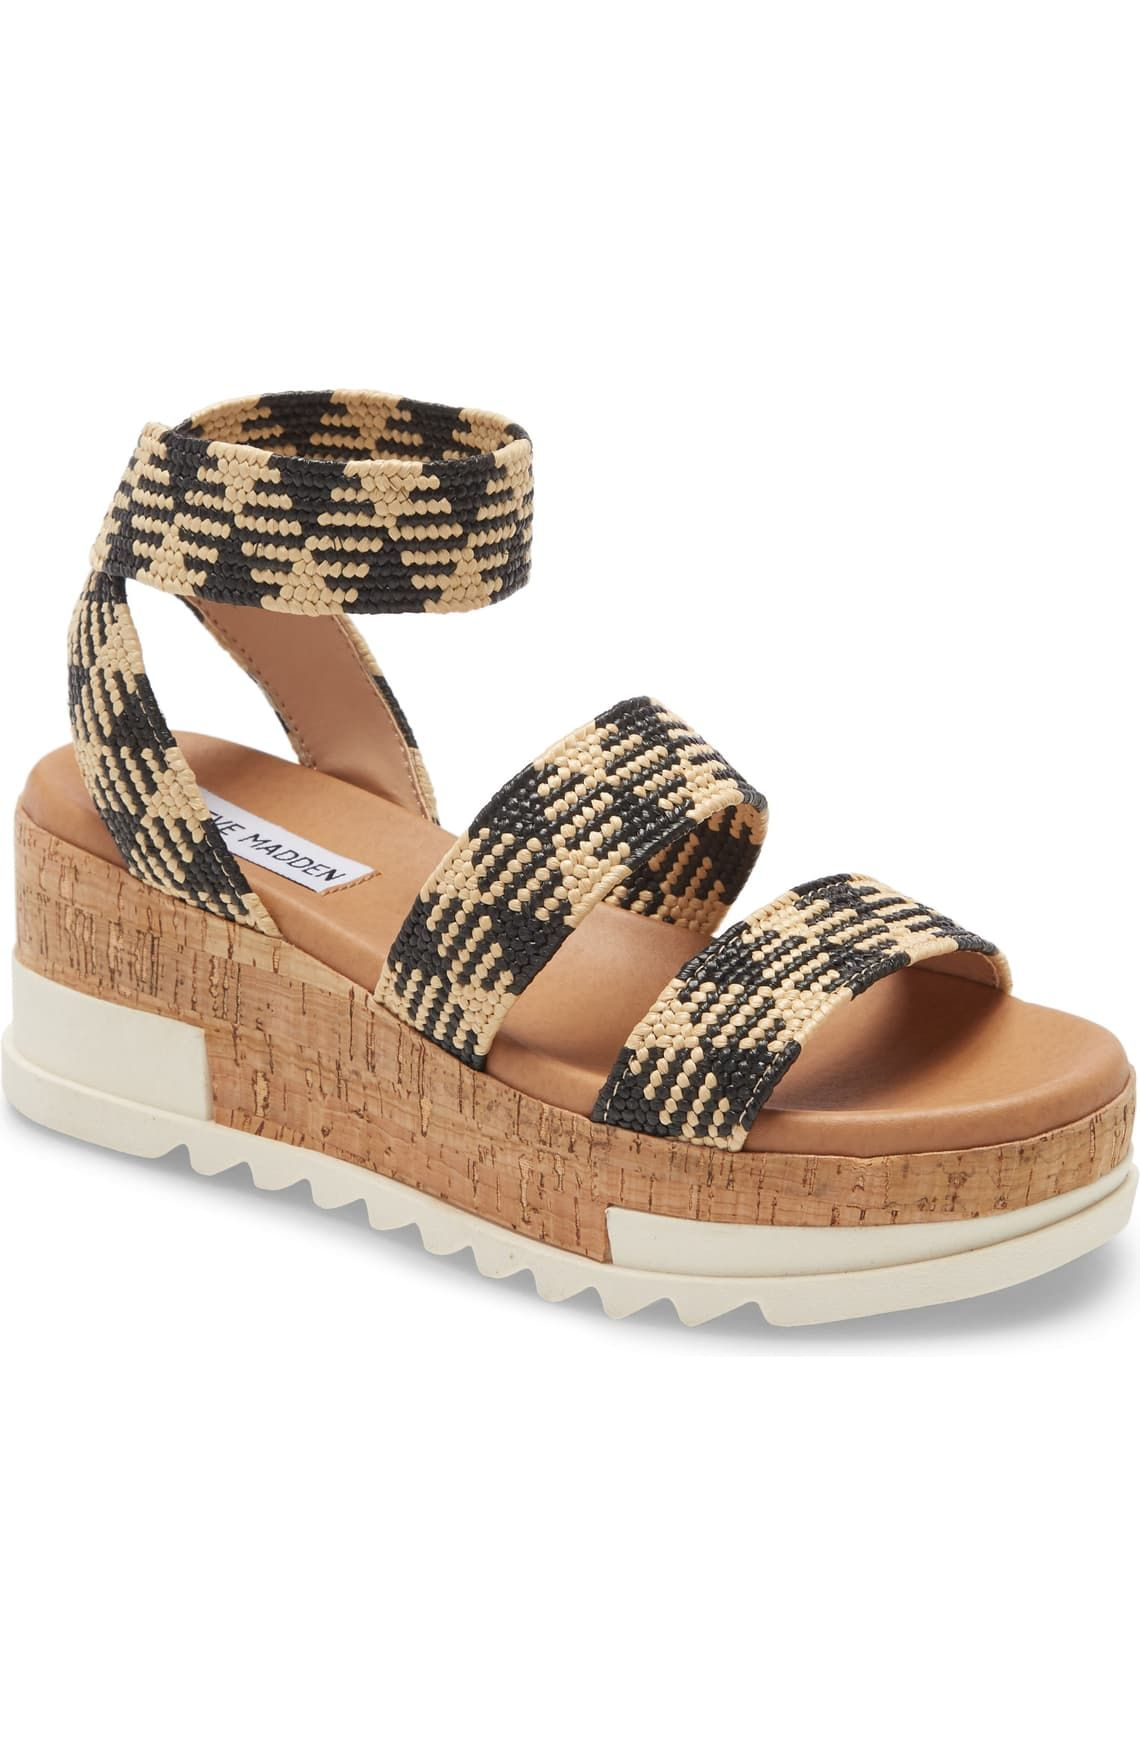 Platform wedge sandals, Wedge sandals